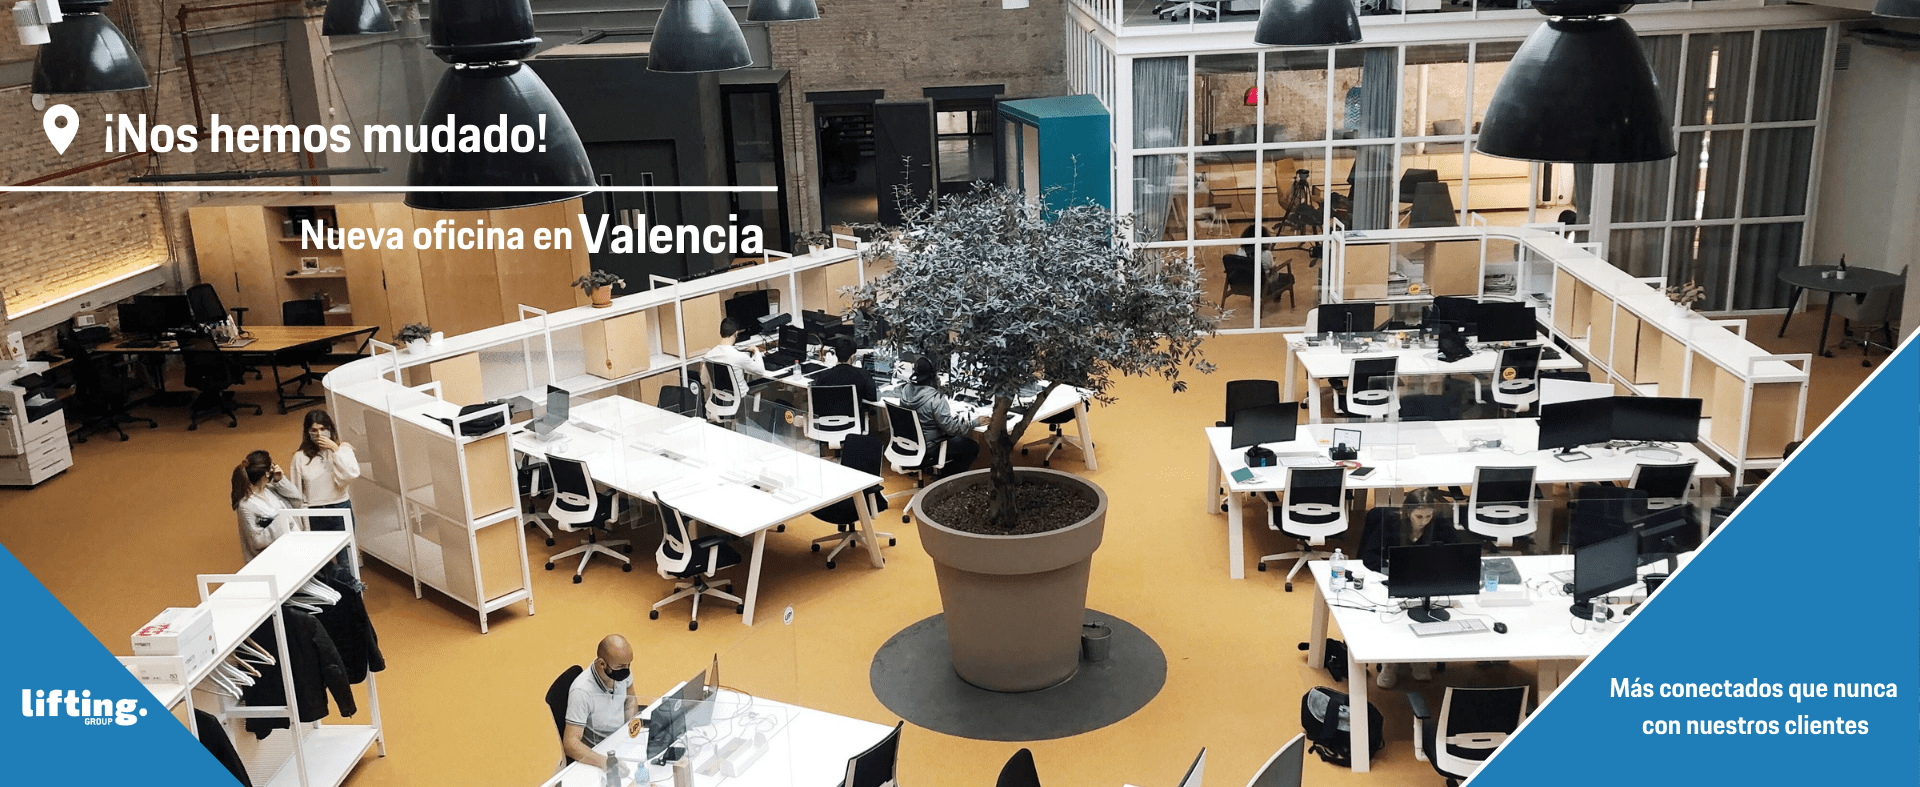 ¡Nos hemos mudado! ¡Nueva oficina Lifting Group Valencia!